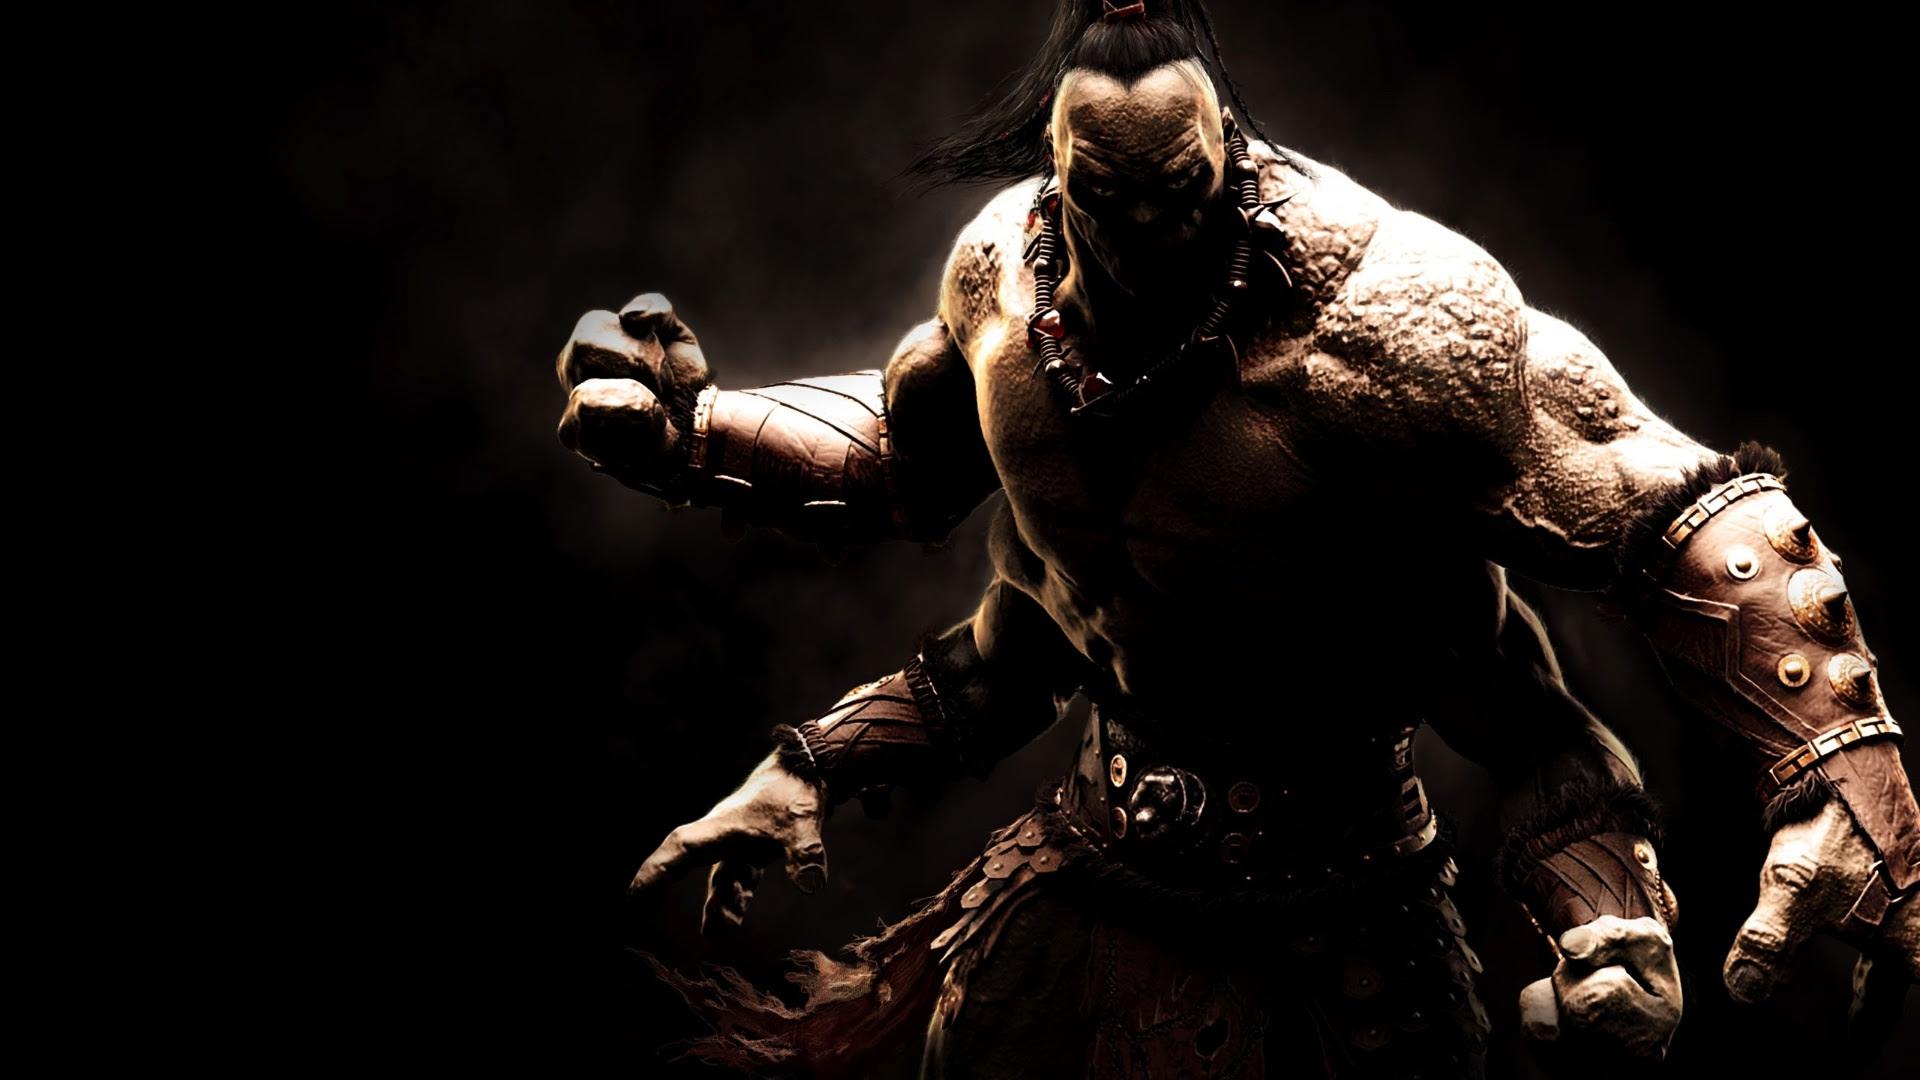 Mortal Kombat X Wallpaper 13